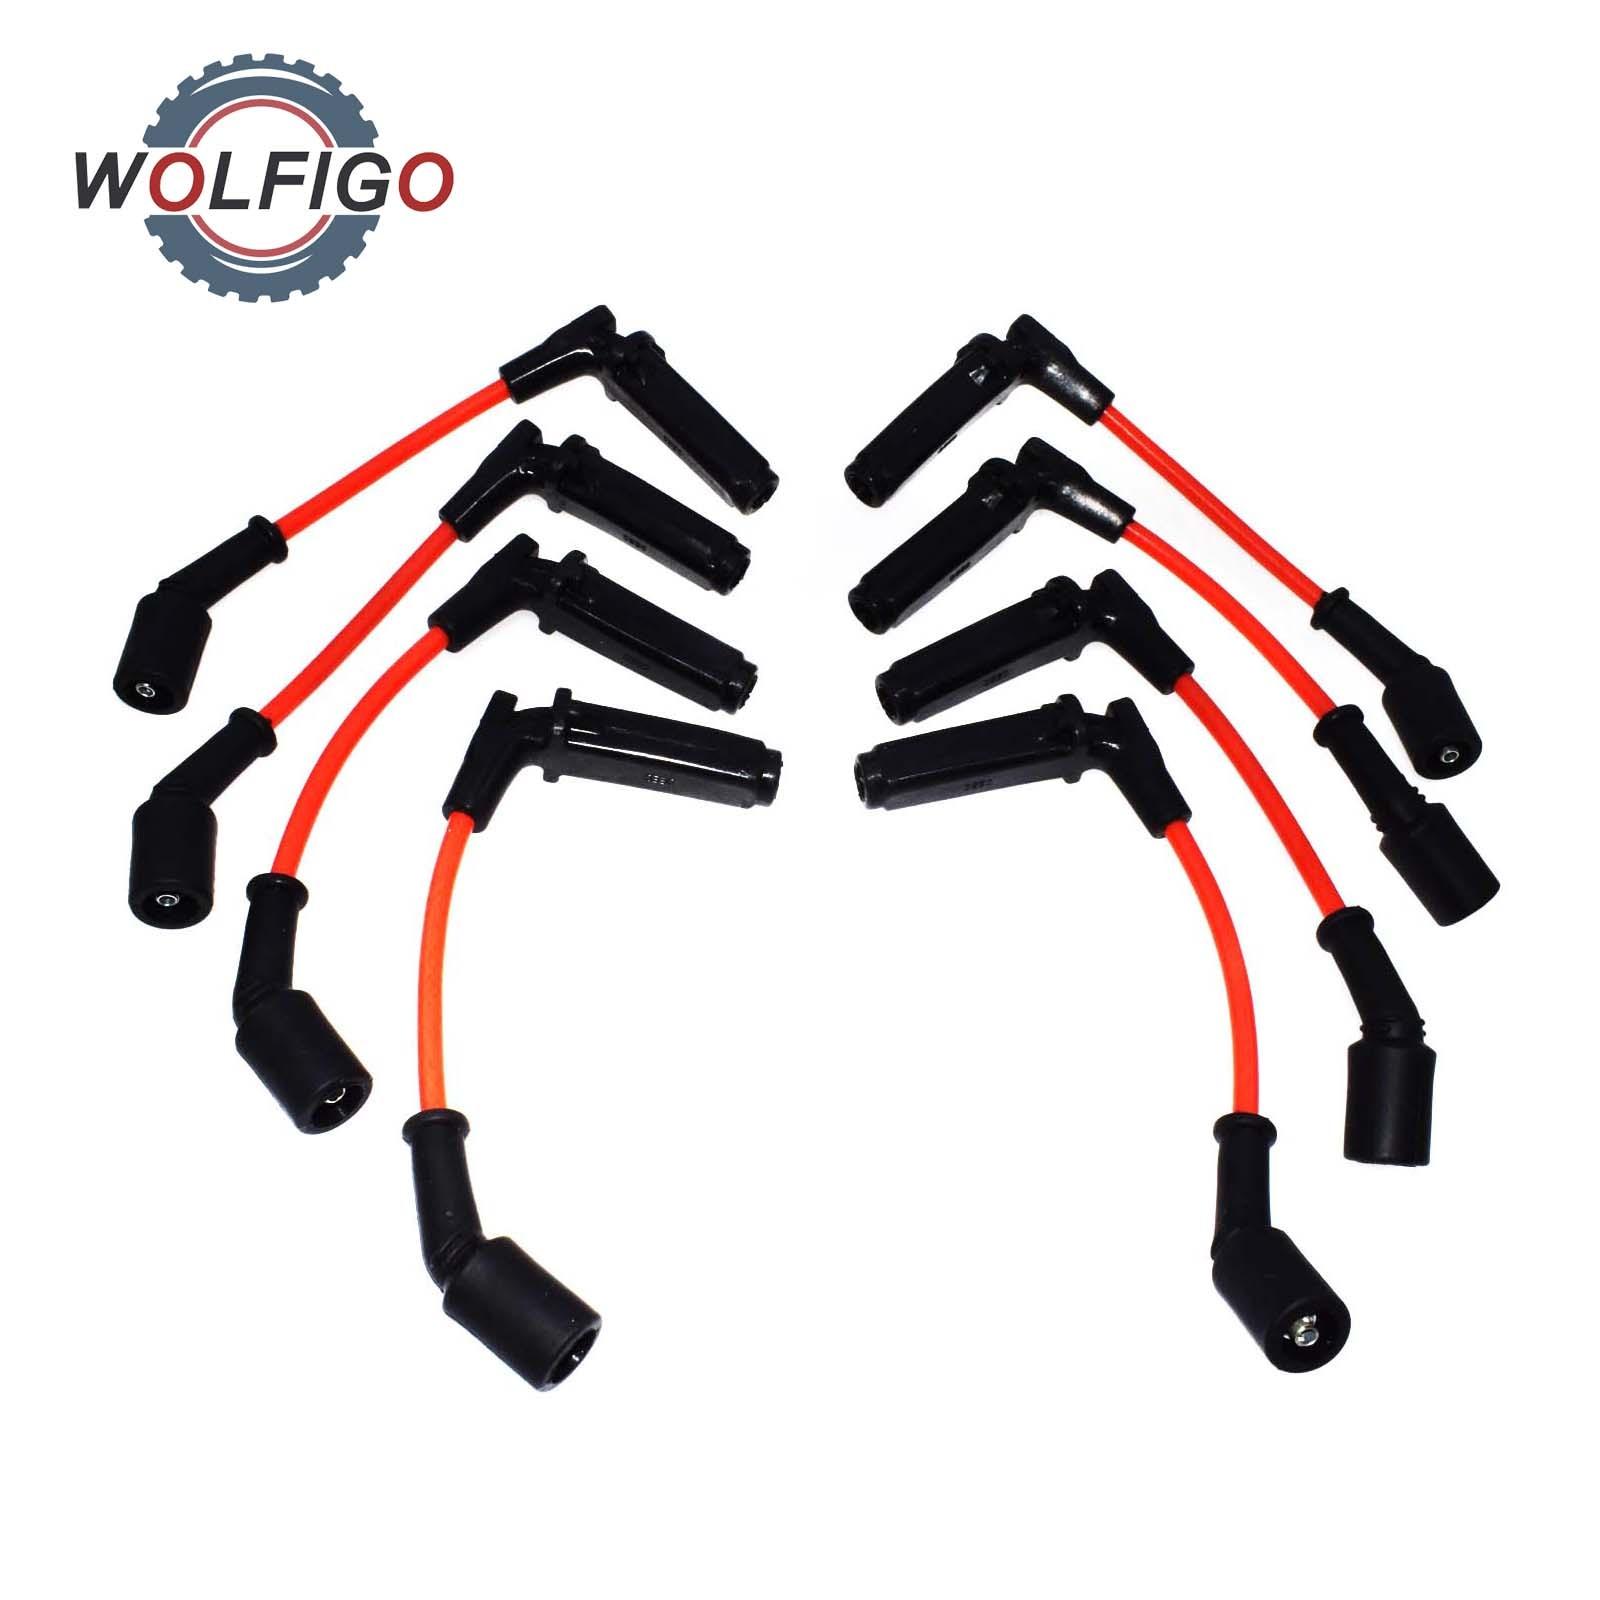 WOLFIGO 8 Pcs Spark Plug Ignition Wires for Chevrolet SSR Tahoe GMC Yukon Saab Buick Cadillac Pontiac Hummer 748RR 671-8161